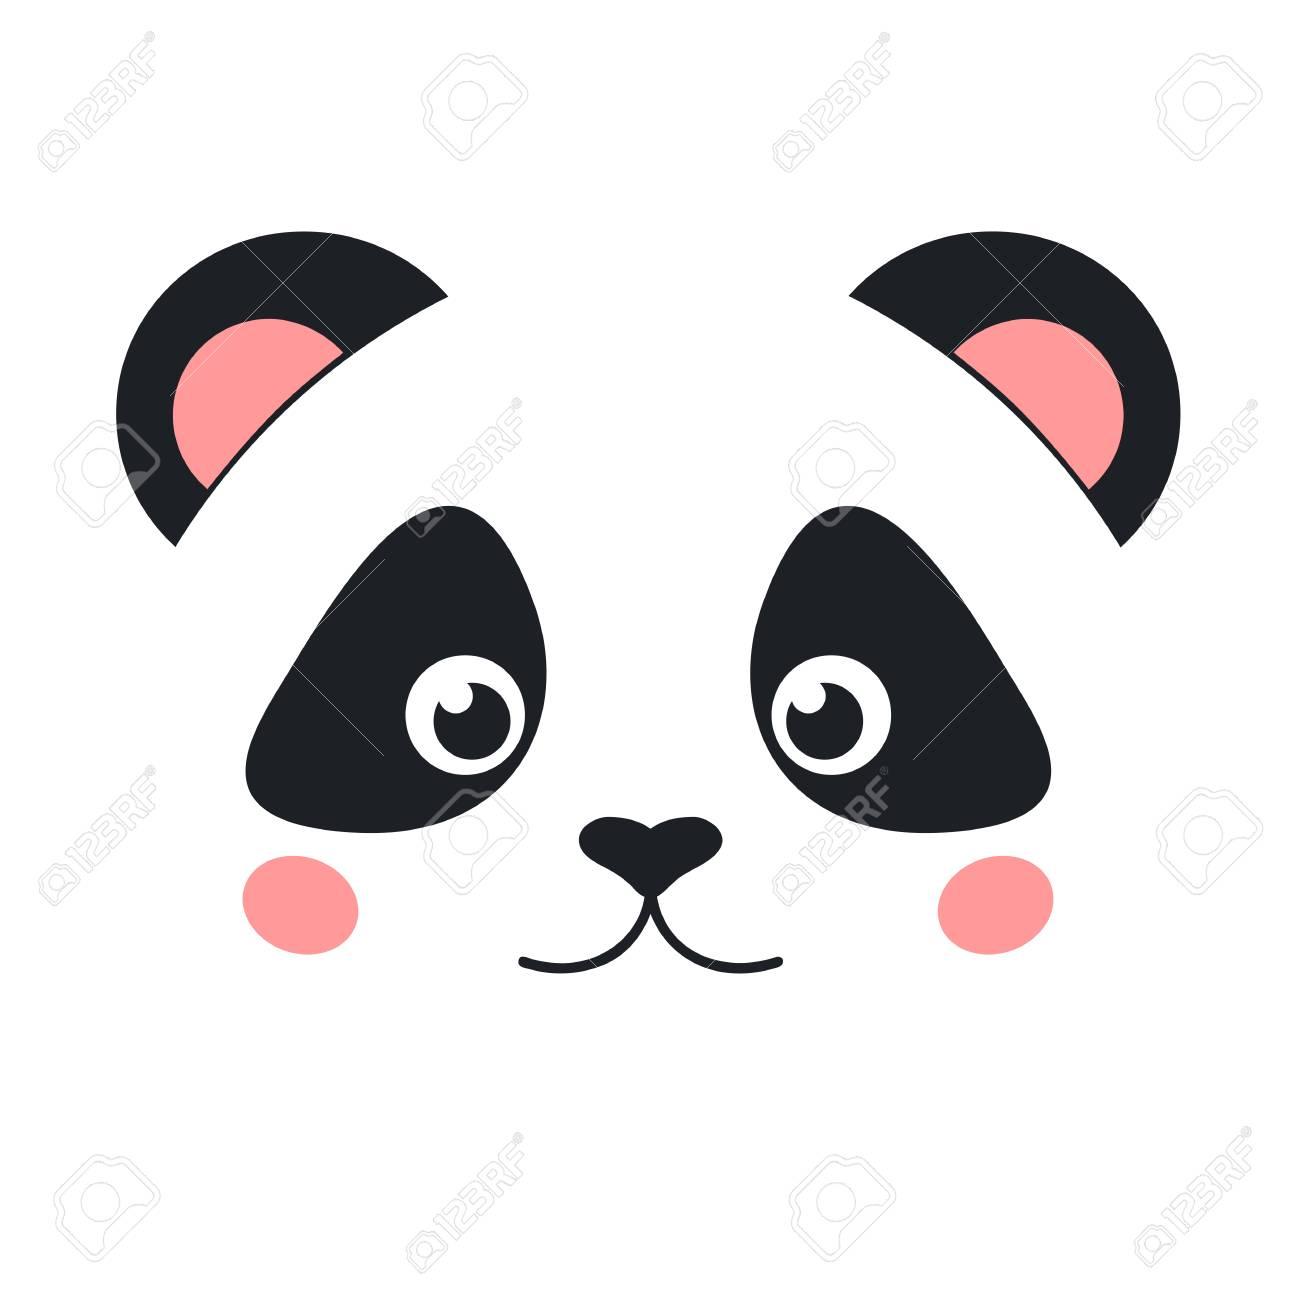 Cute panda face isolated on white background. Flat style - 74943131